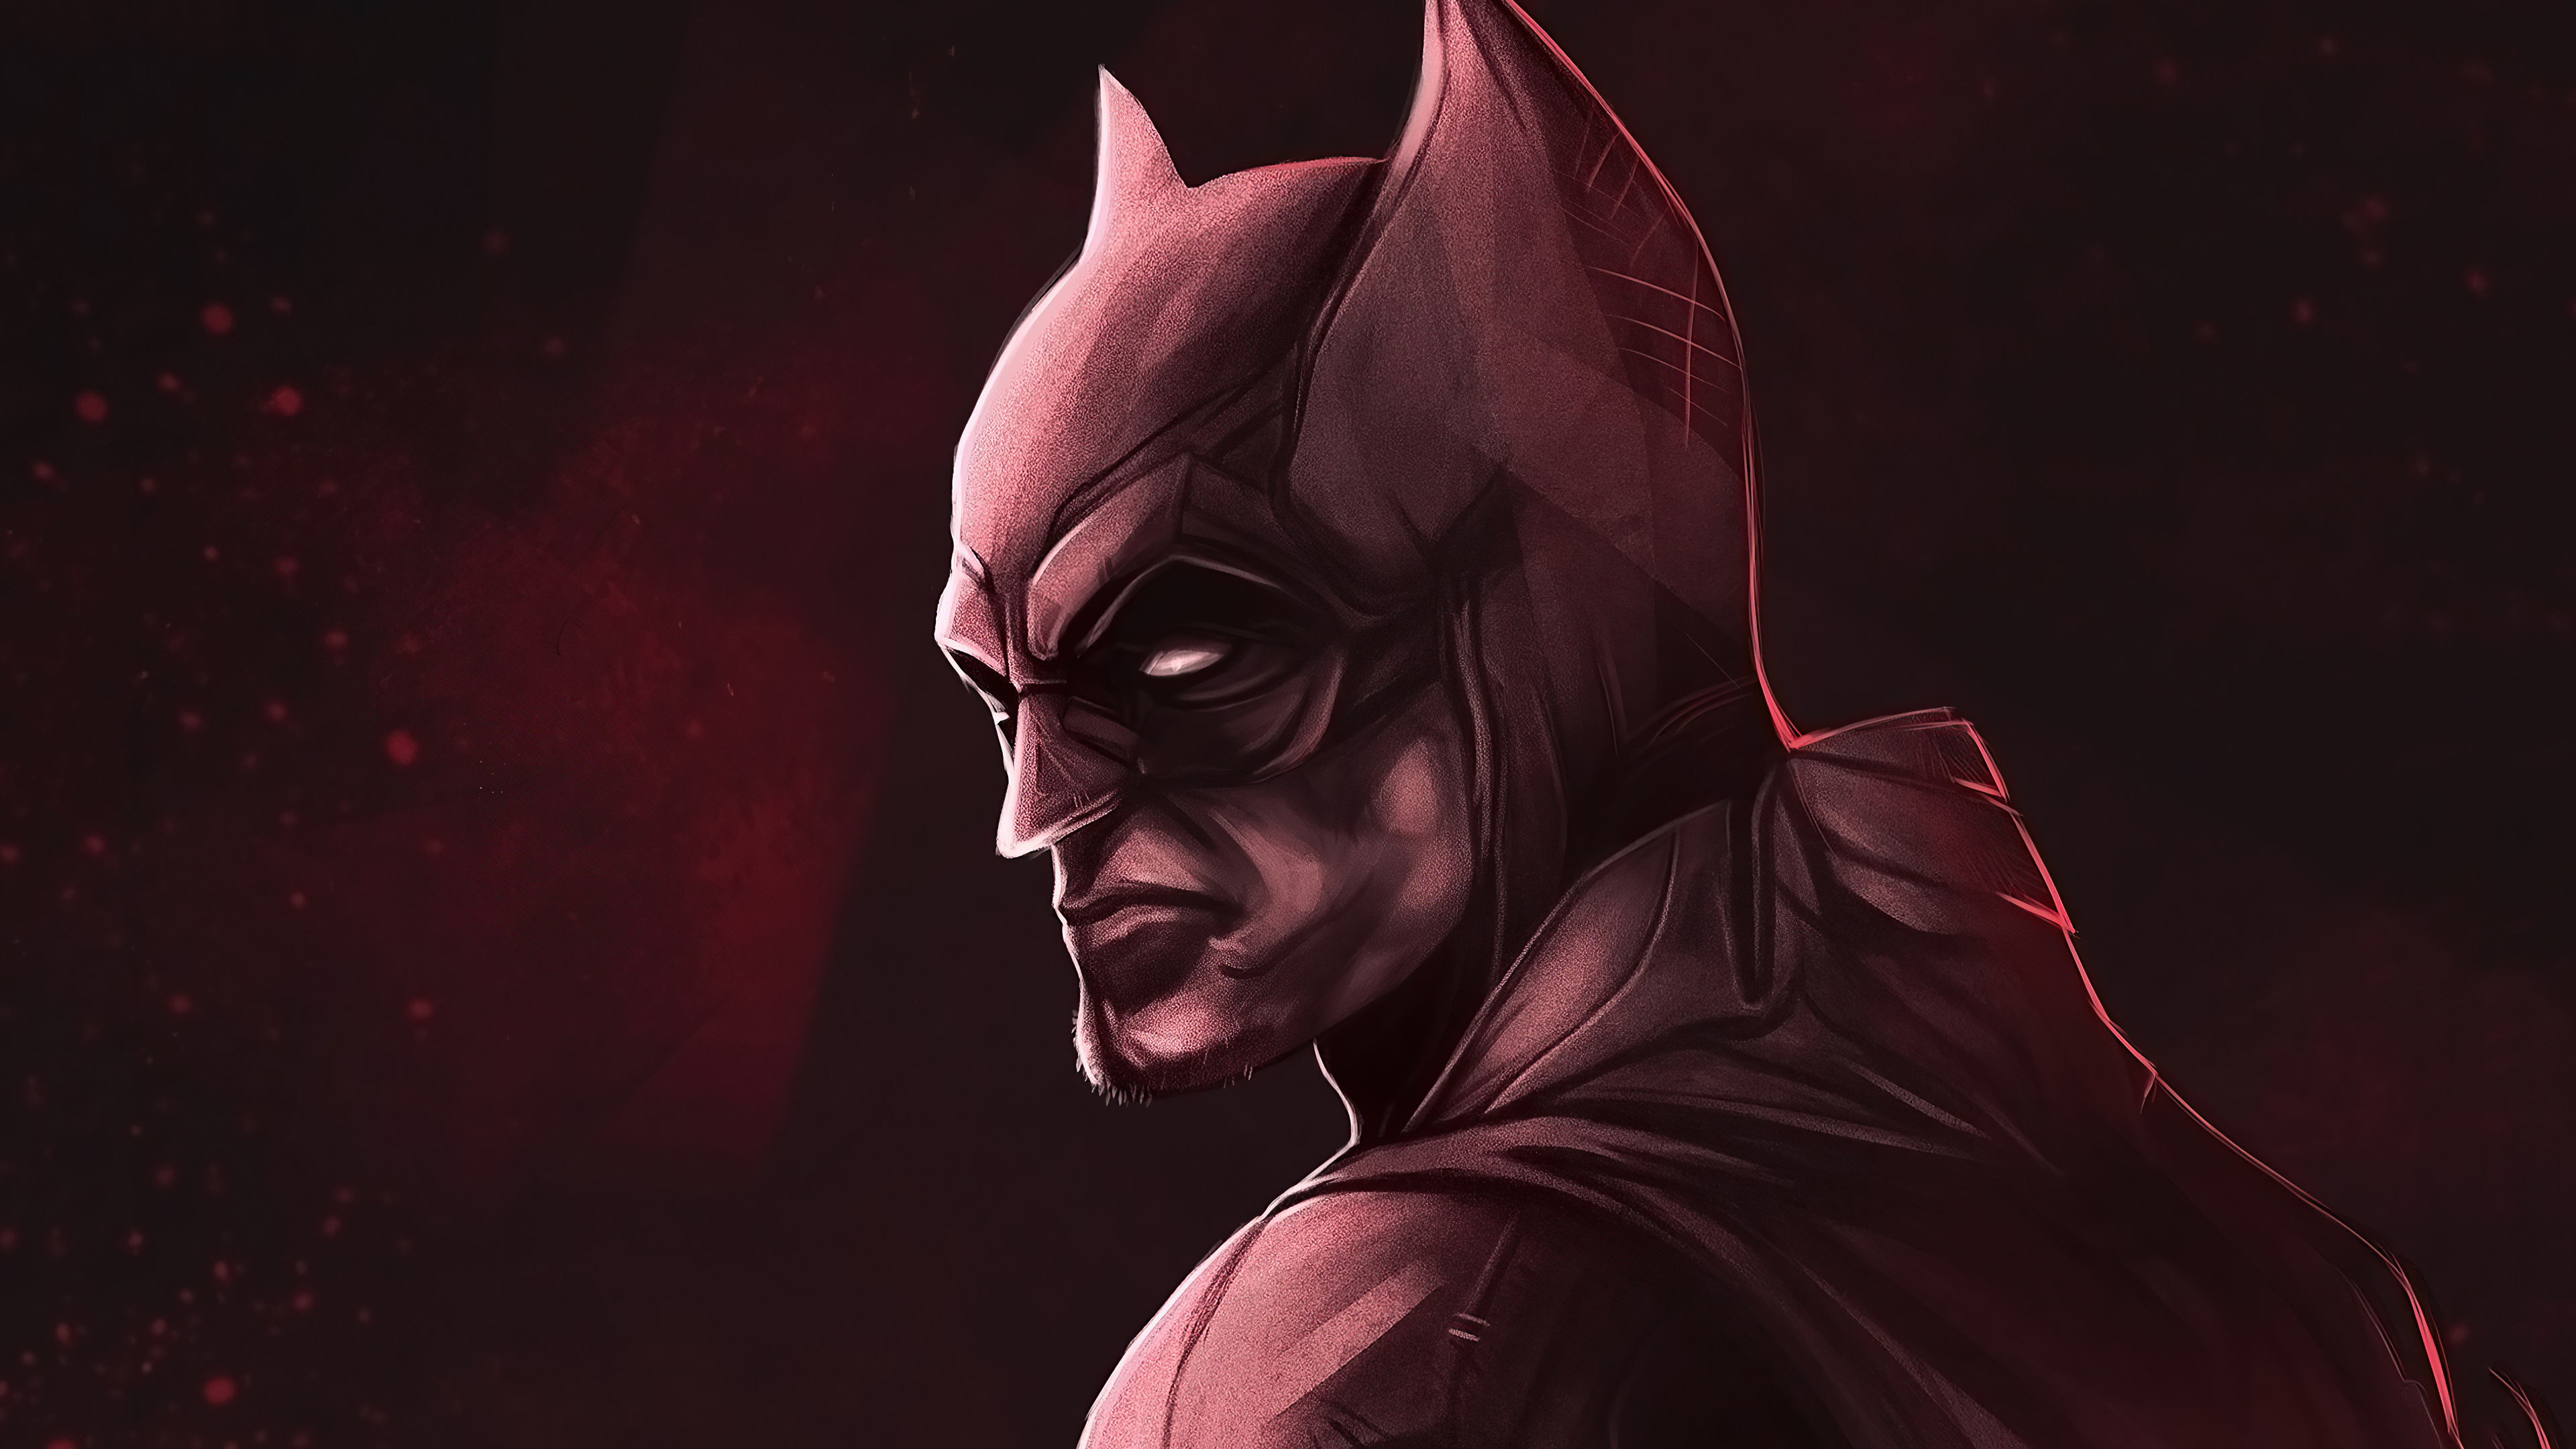 Wallpaper The Batman 2021 New Fanart